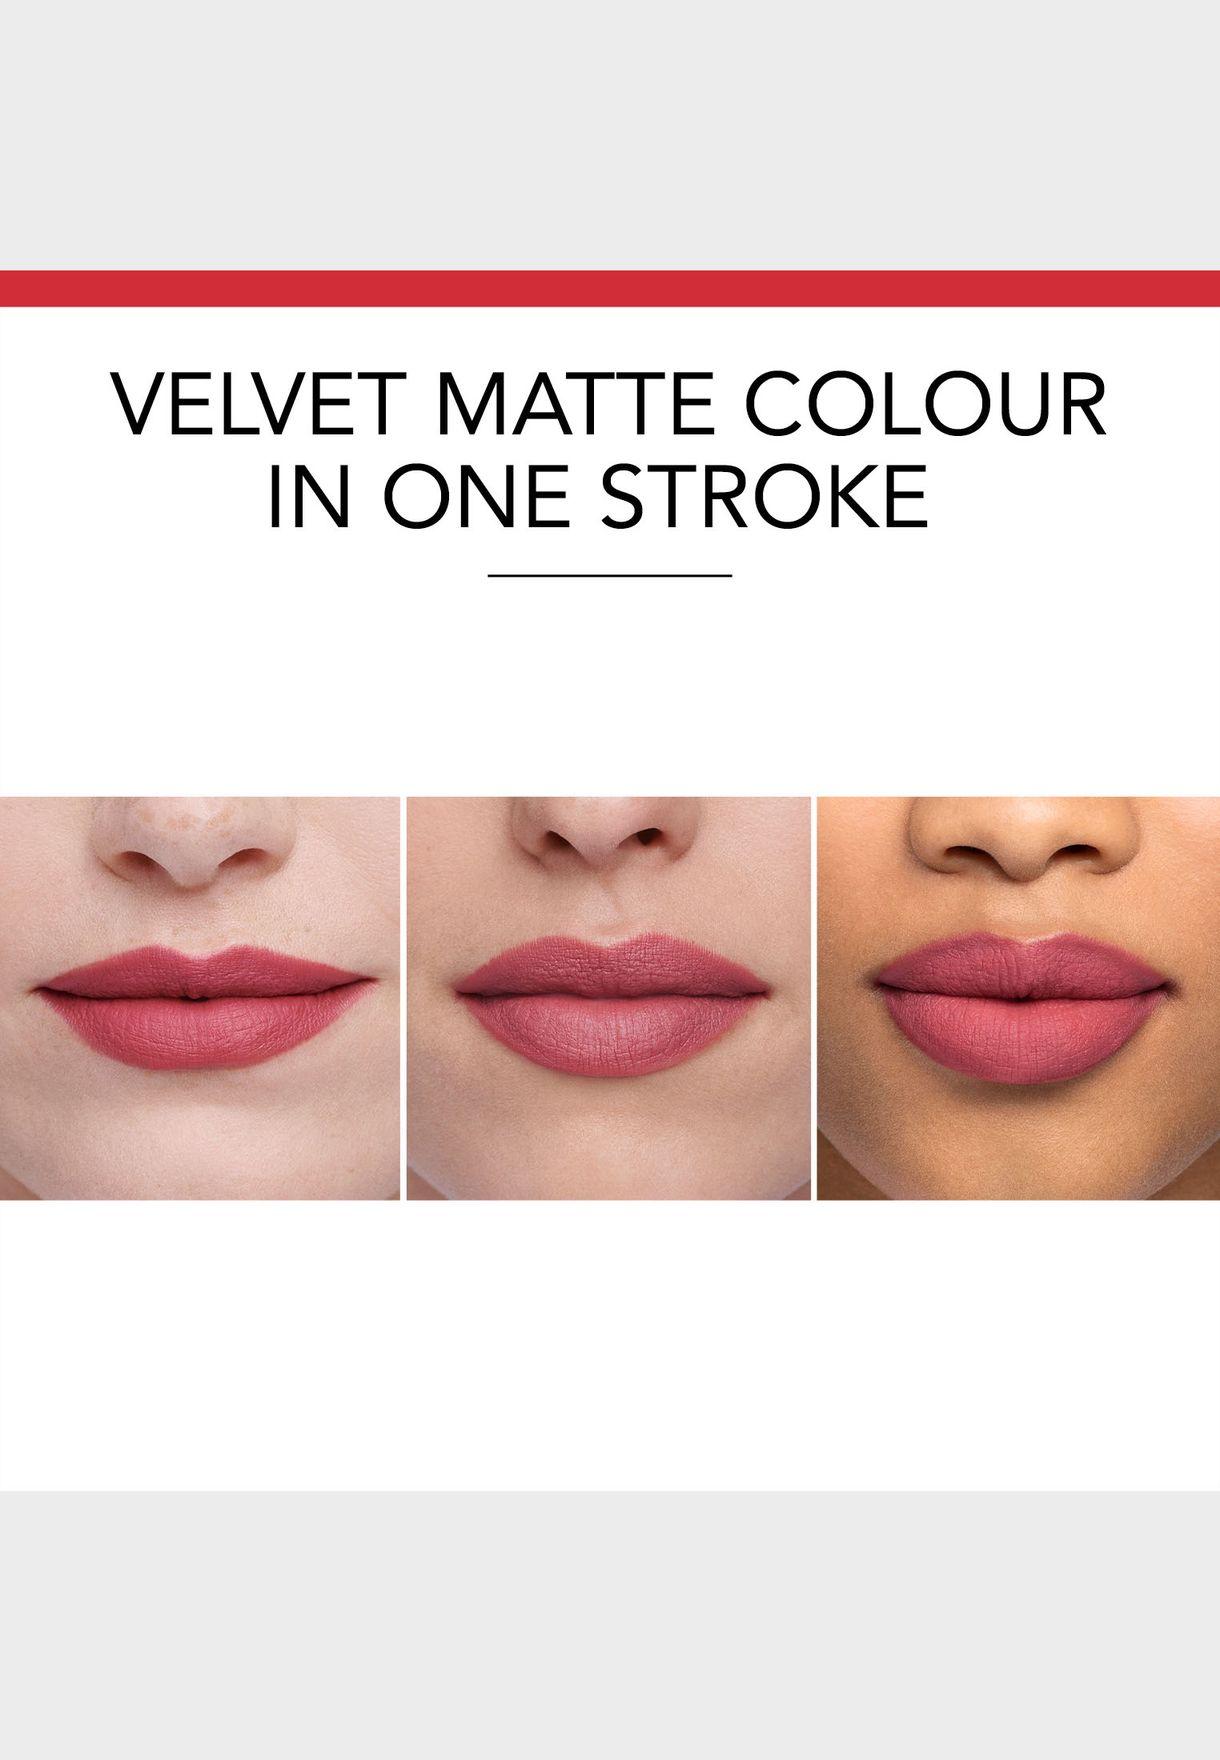 Rouge Velvet The Lipstick 03 Hyppink Chic